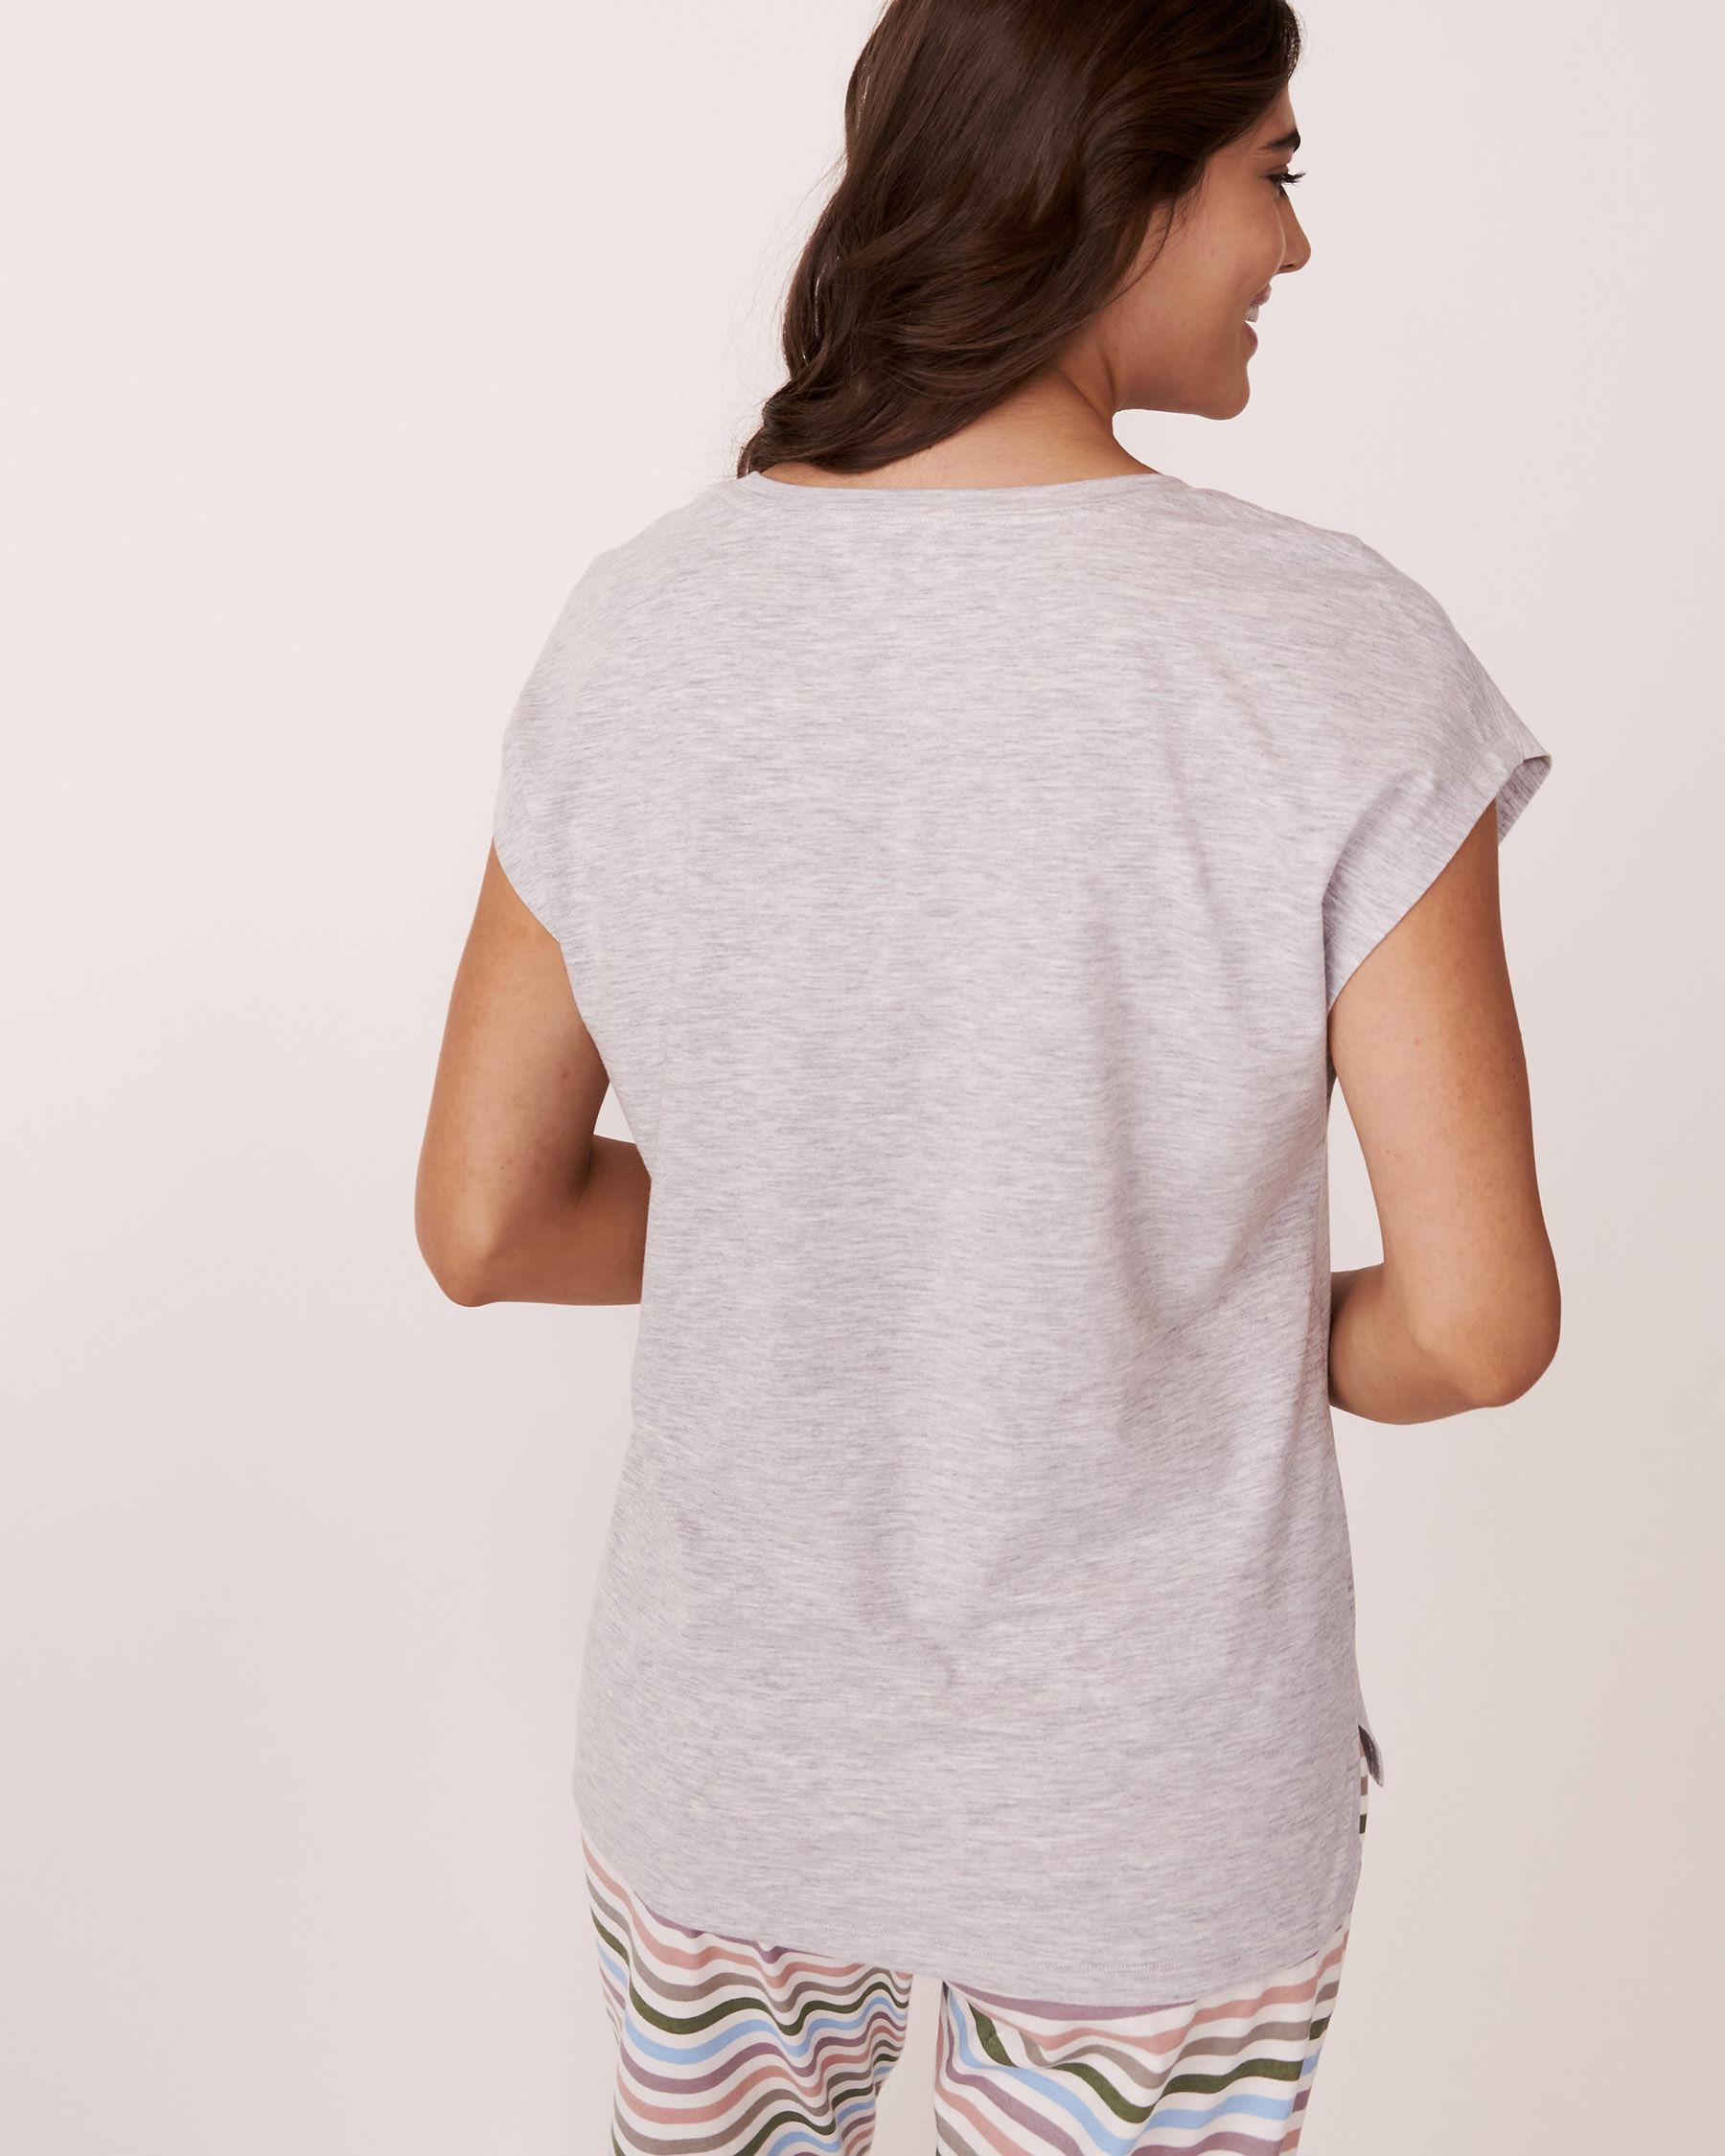 LA VIE EN ROSE Crew Neck T-shirt Grey 880-386-0-11 - View2